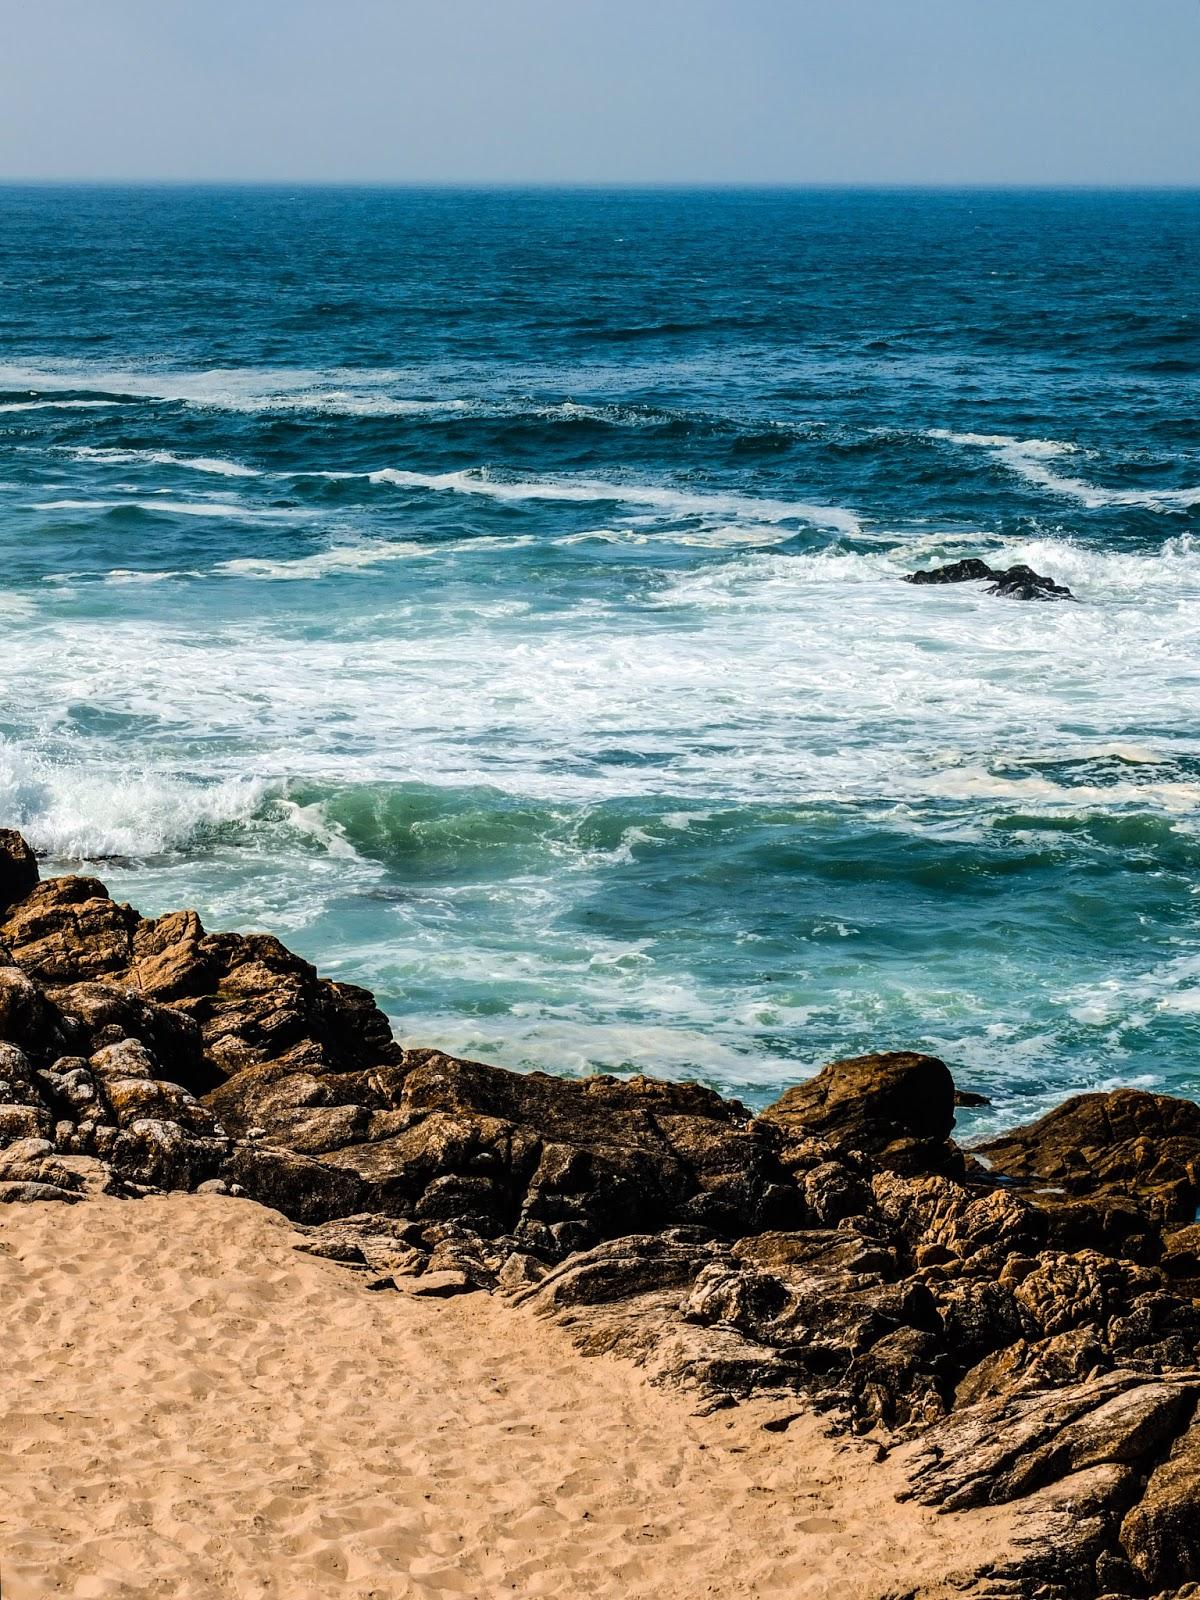 Waves crashing on rocks in Porto, Portugal.